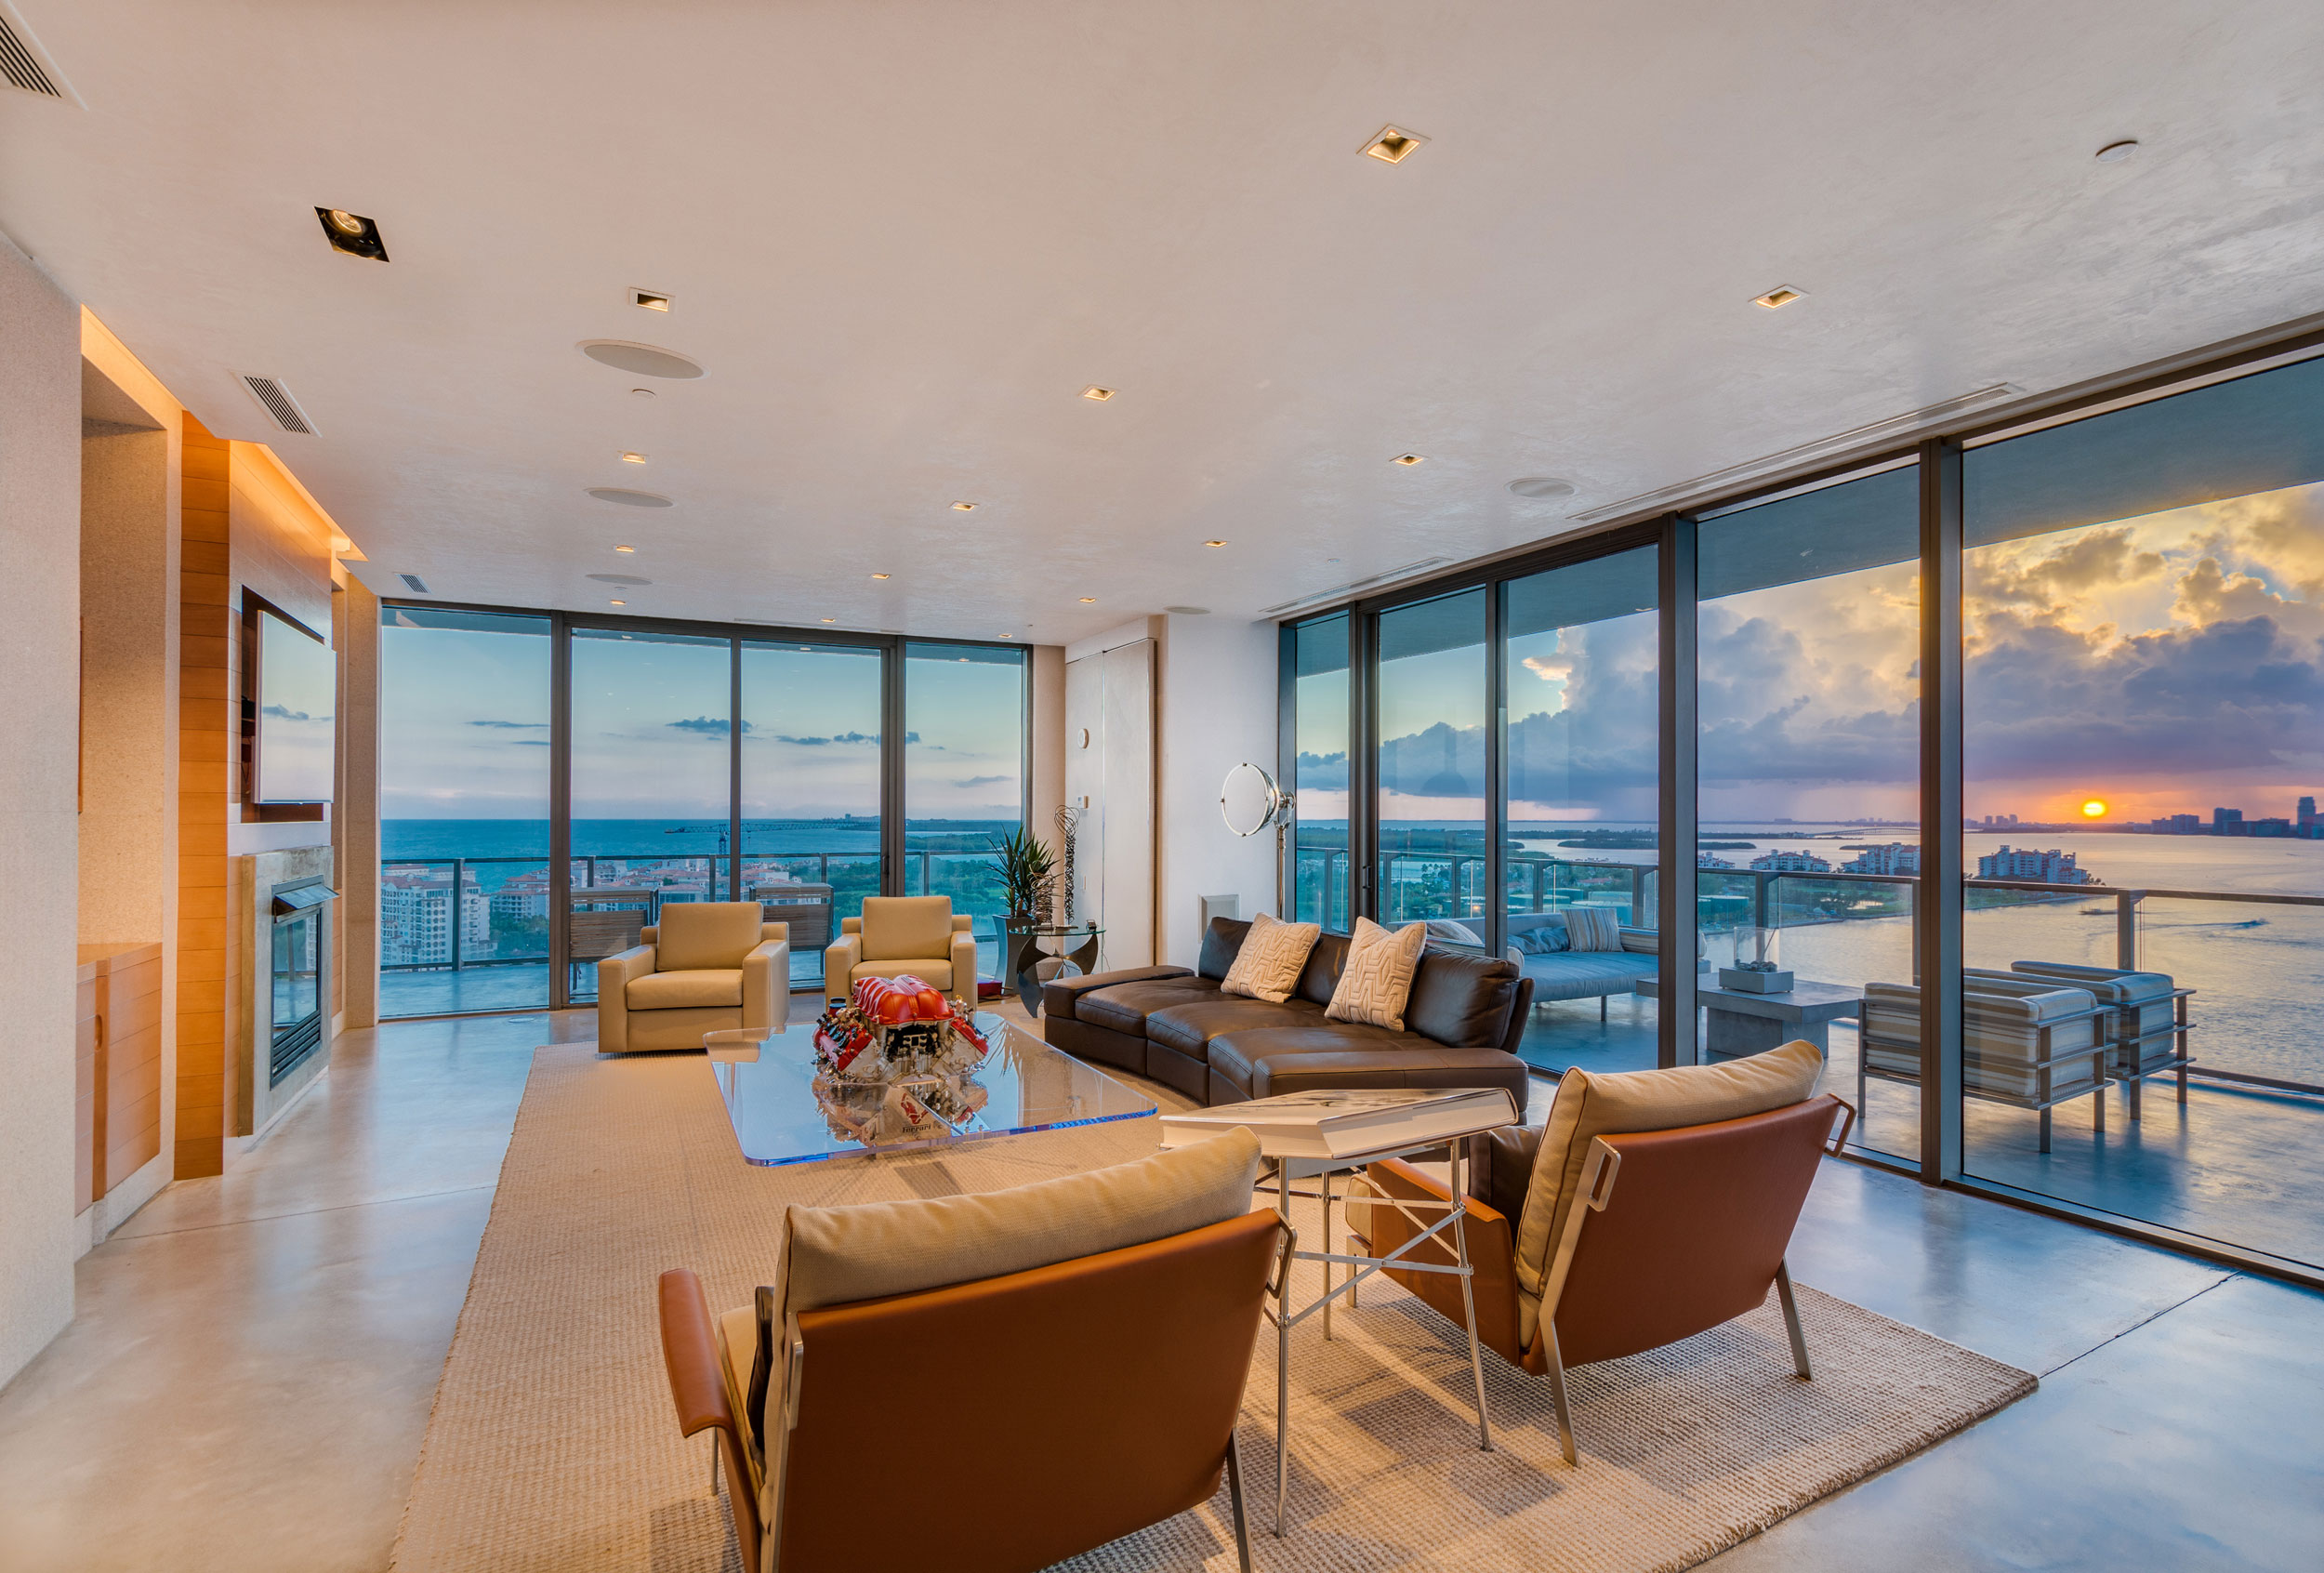 Rising high above Miami's South Beach, this luxury condominium enjoys 270-degree views.